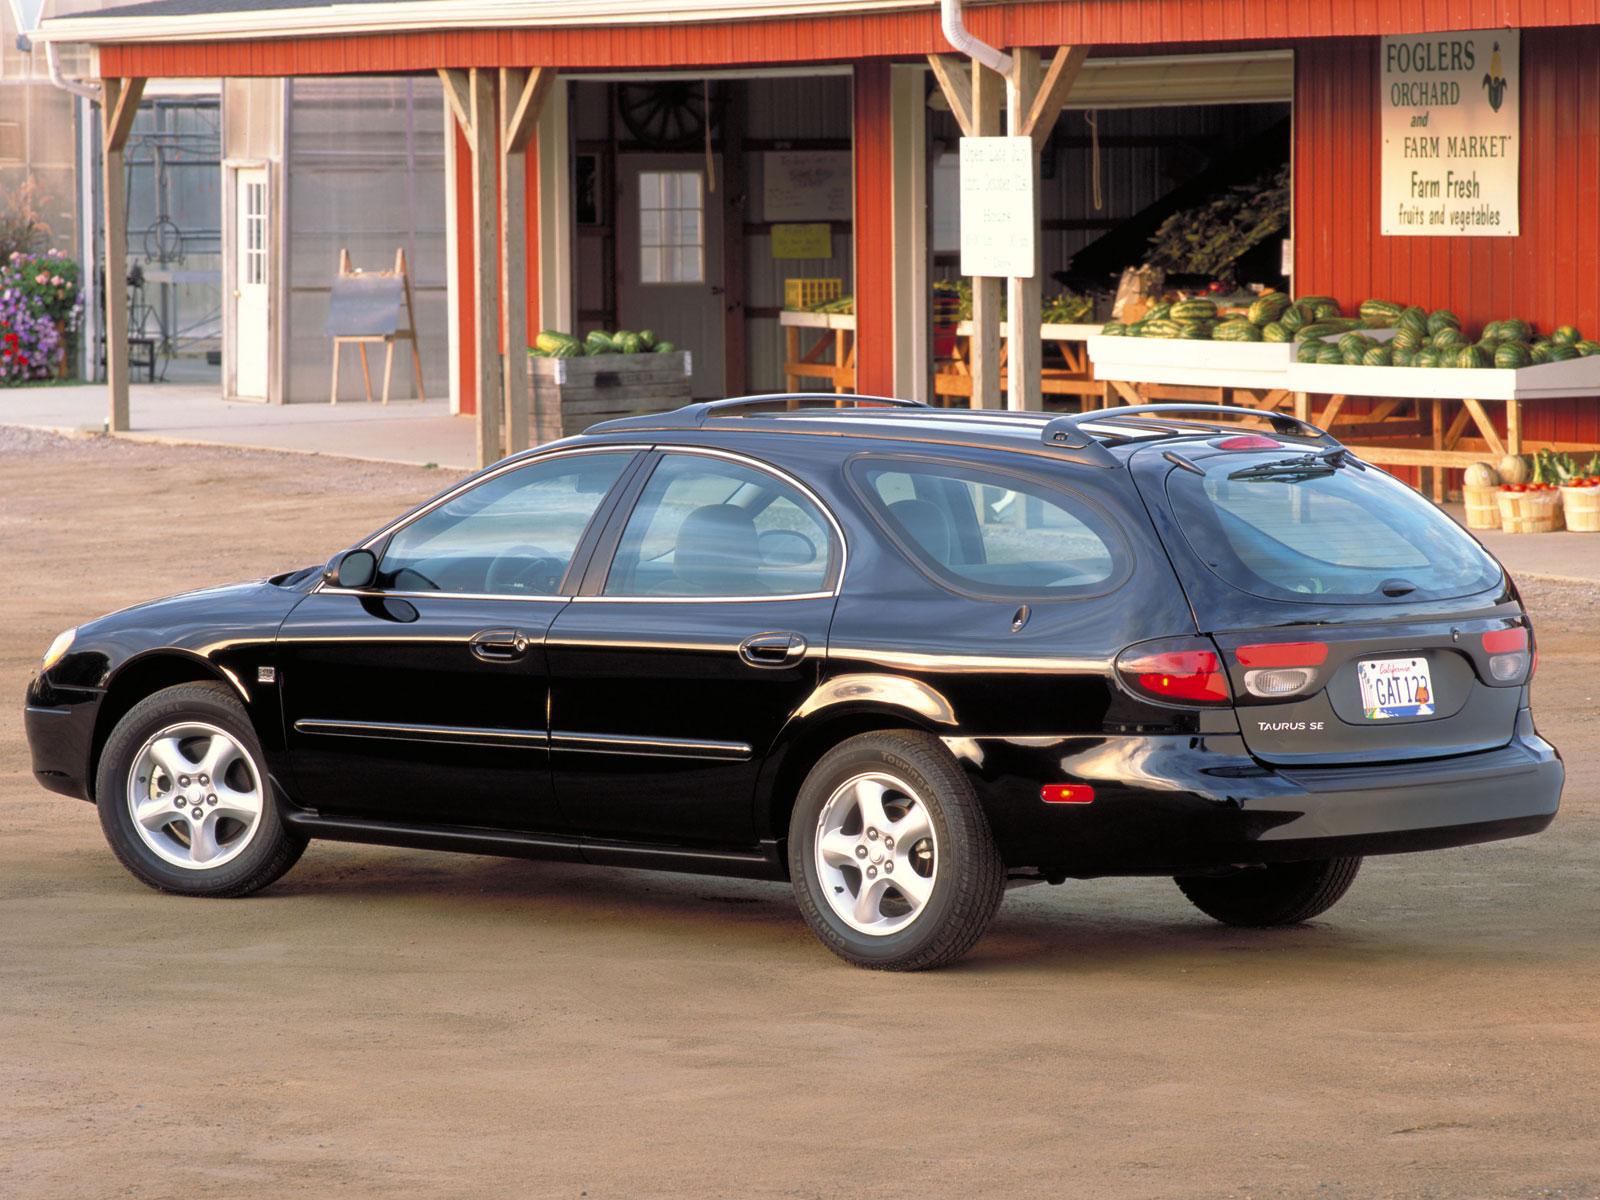 2007 ford taurus station wagon. Black Bedroom Furniture Sets. Home Design Ideas